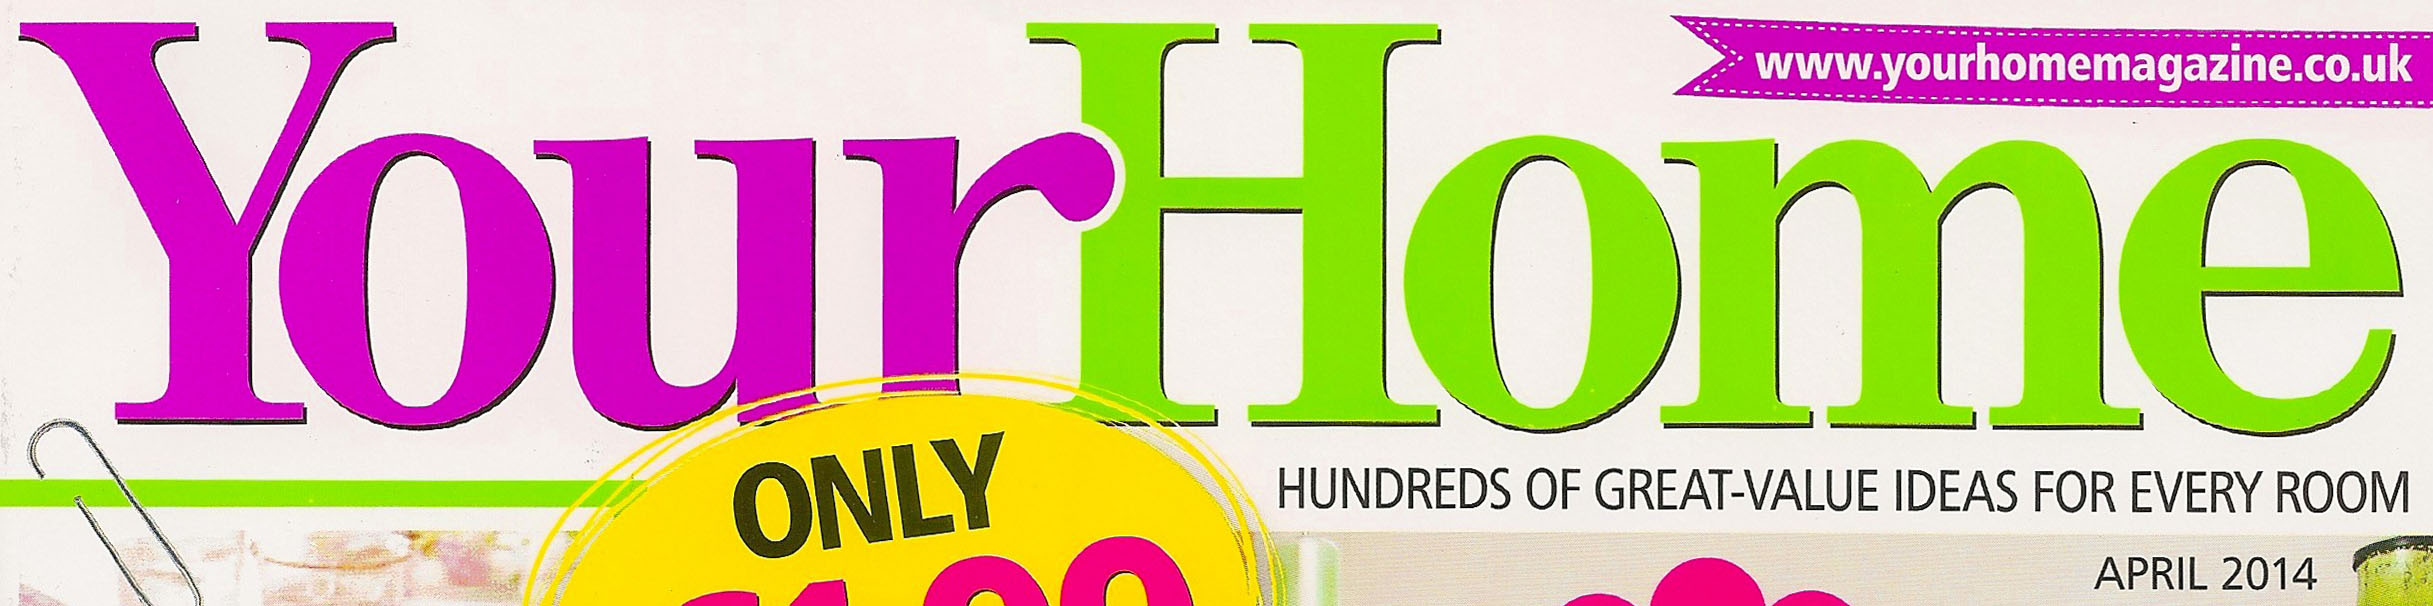 Your Home Cover Logo April 2014.jpg